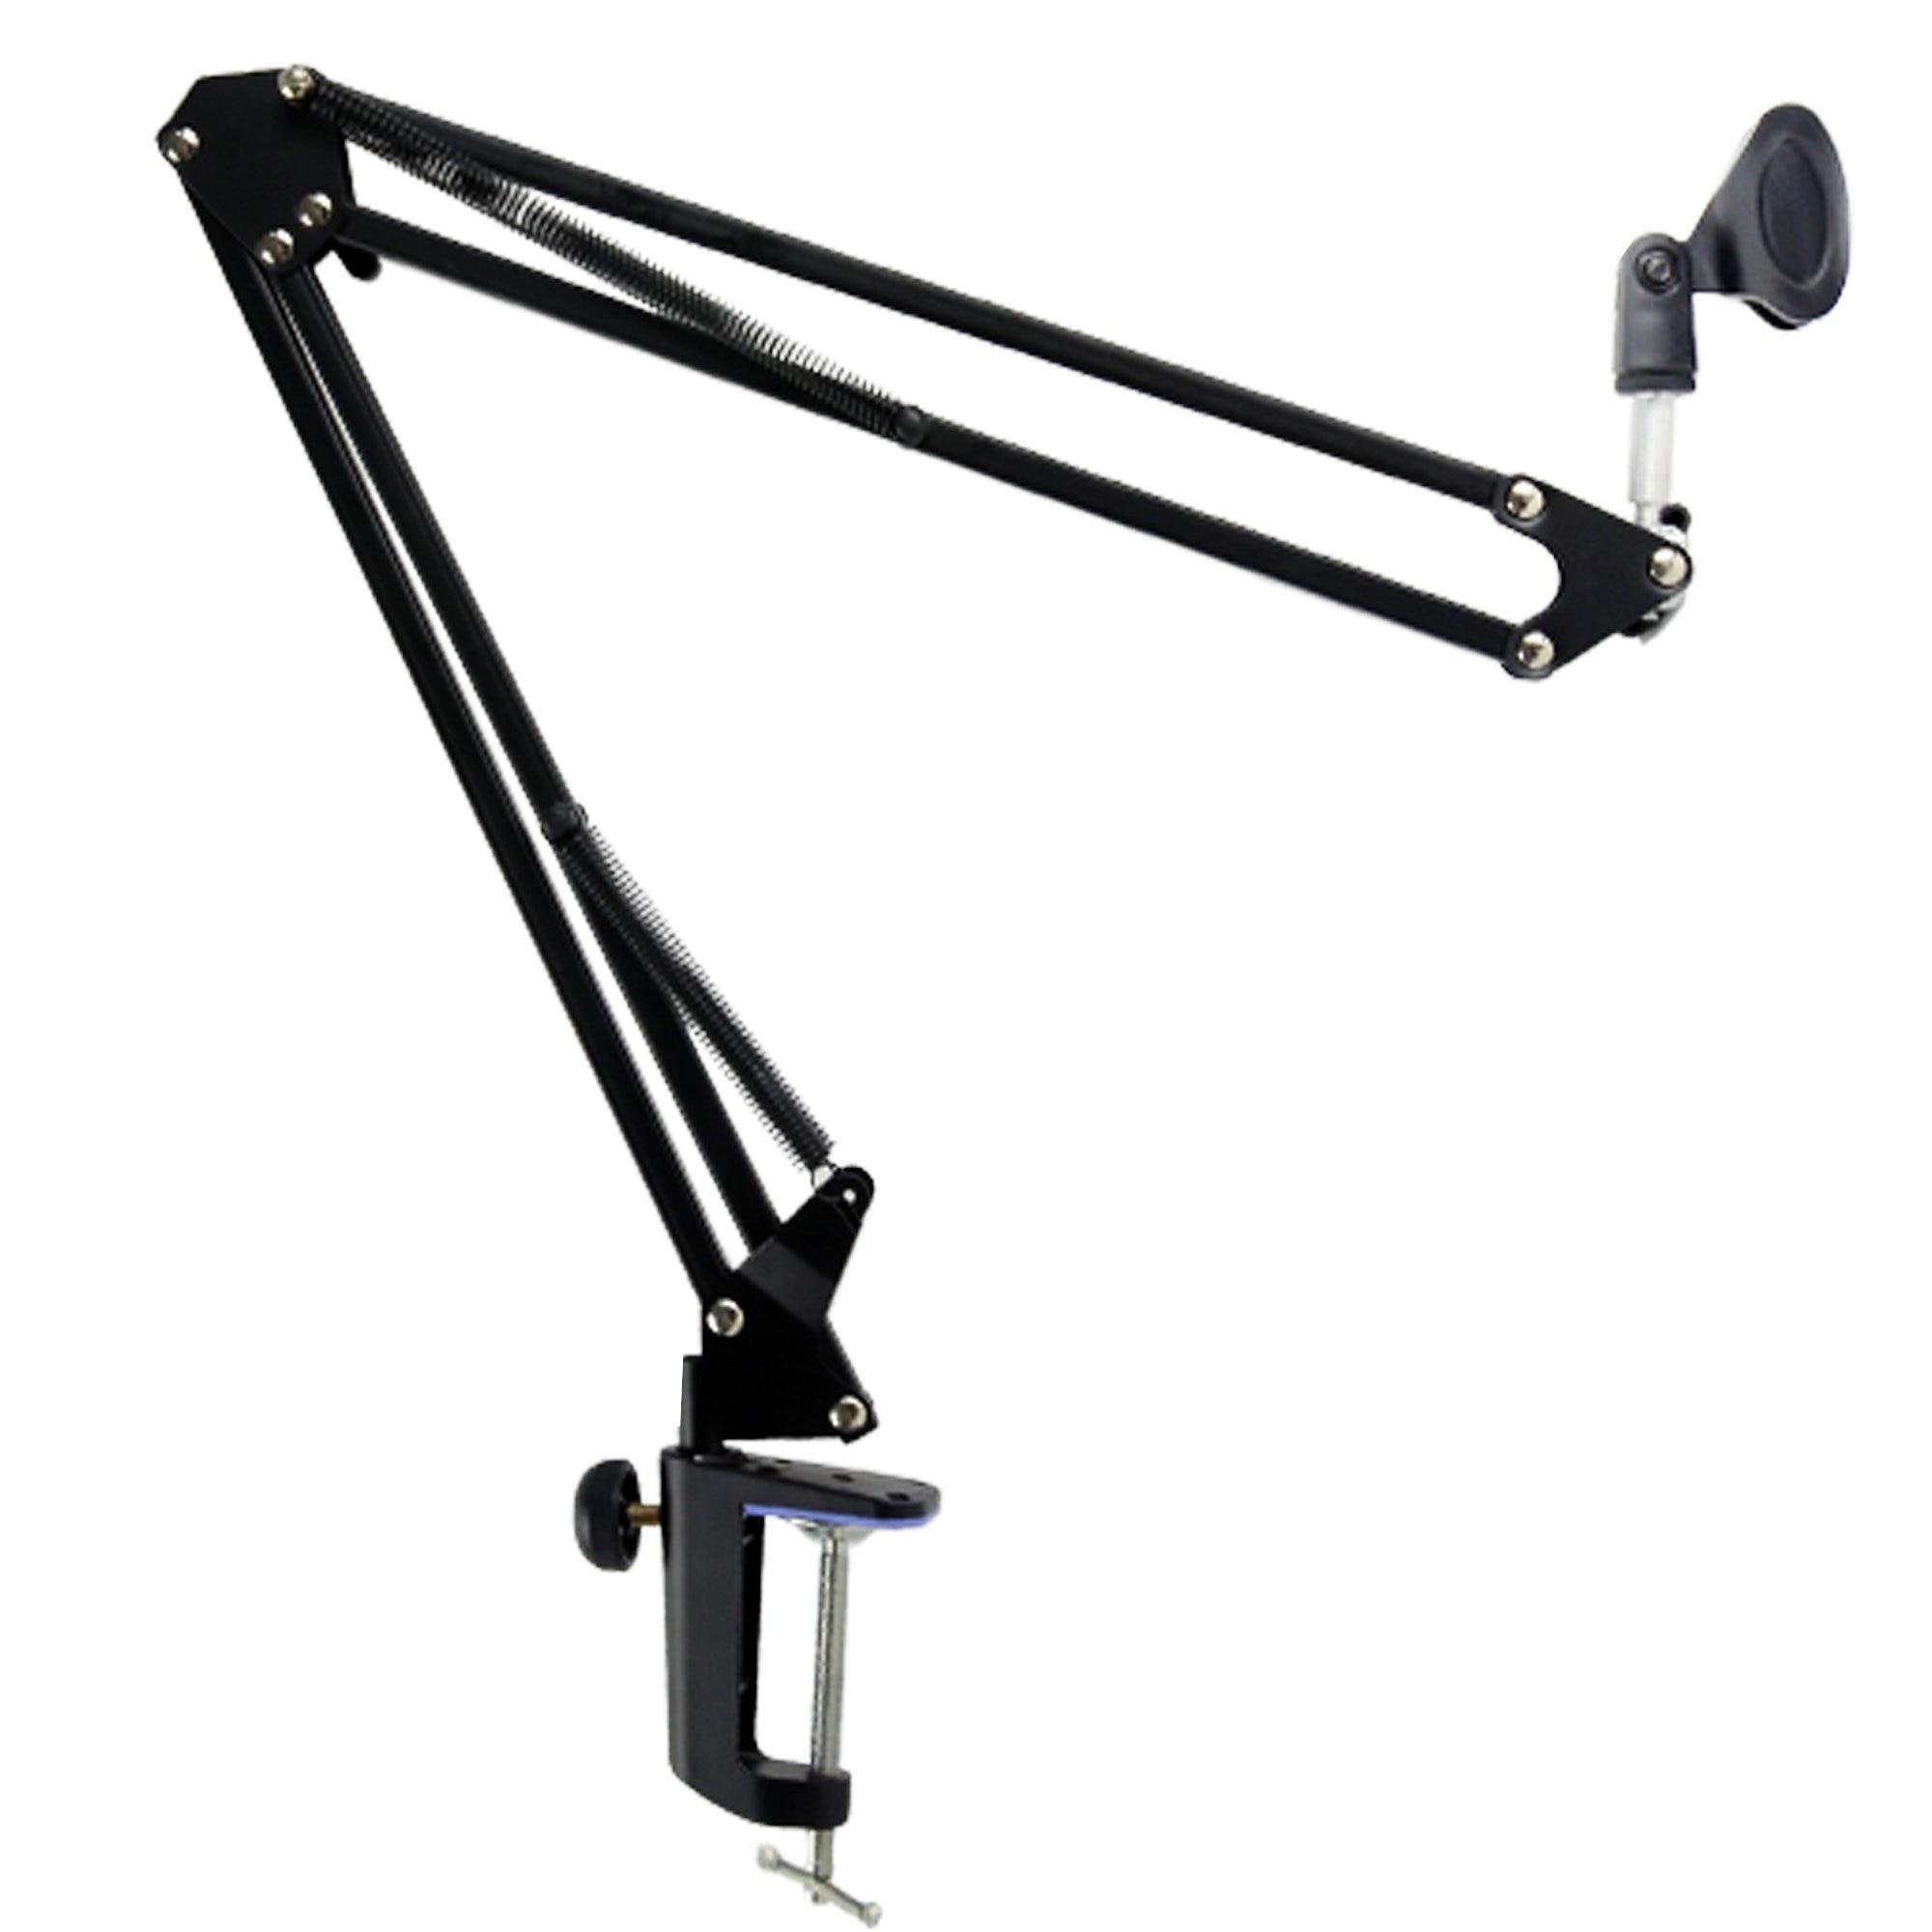 Extensible grabación micrófono suspensión Boom Scissor Arm Stand titular con micrófono Clip de montaje de mesa